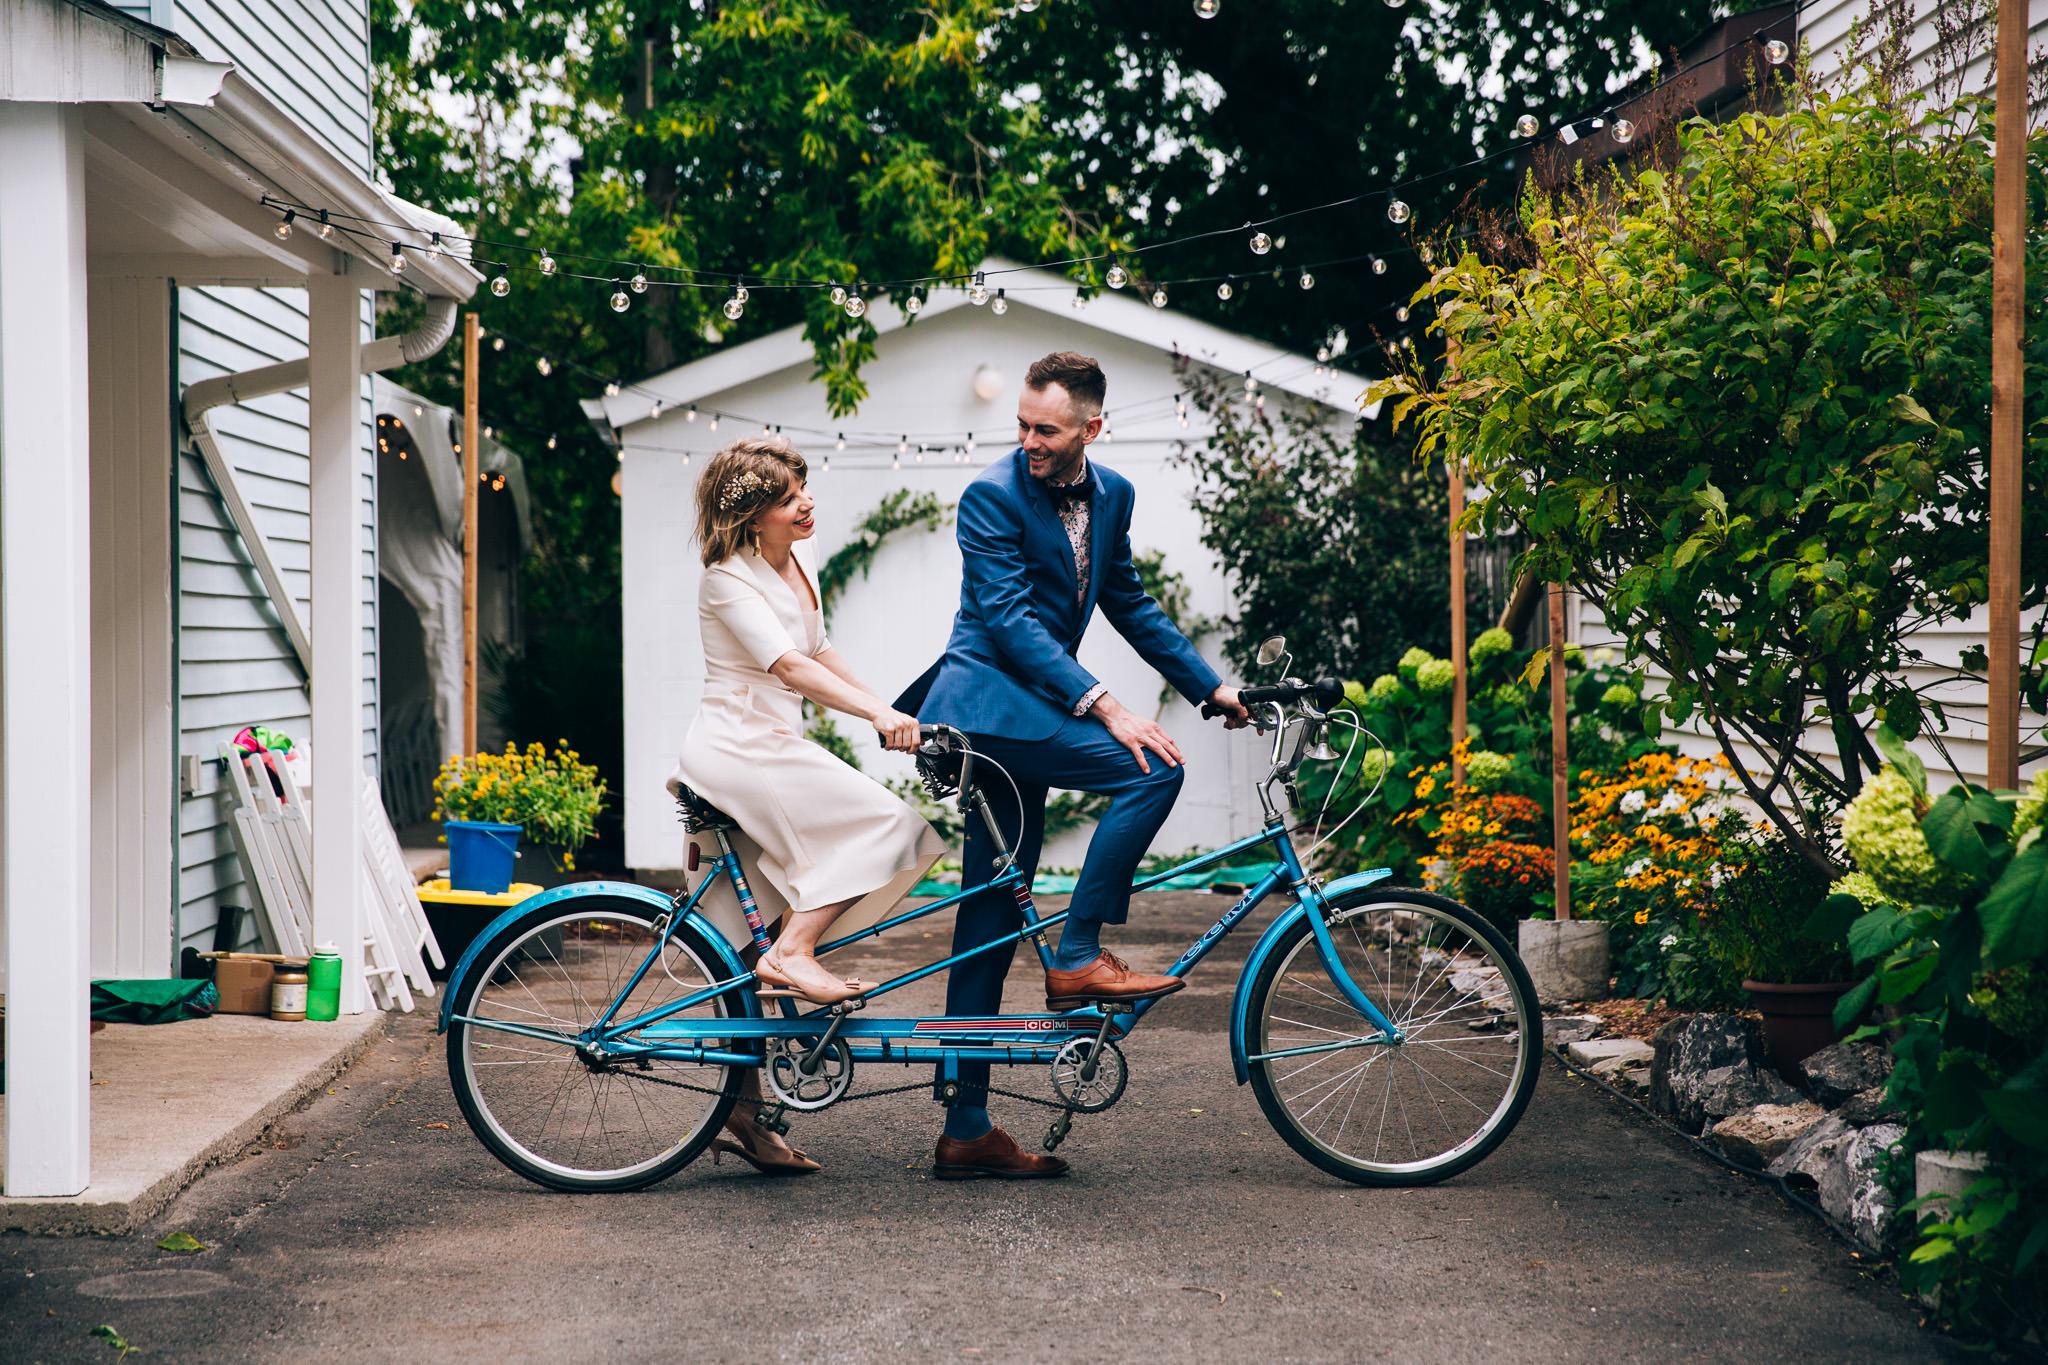 021_Canada-documentary-wedding-photograp